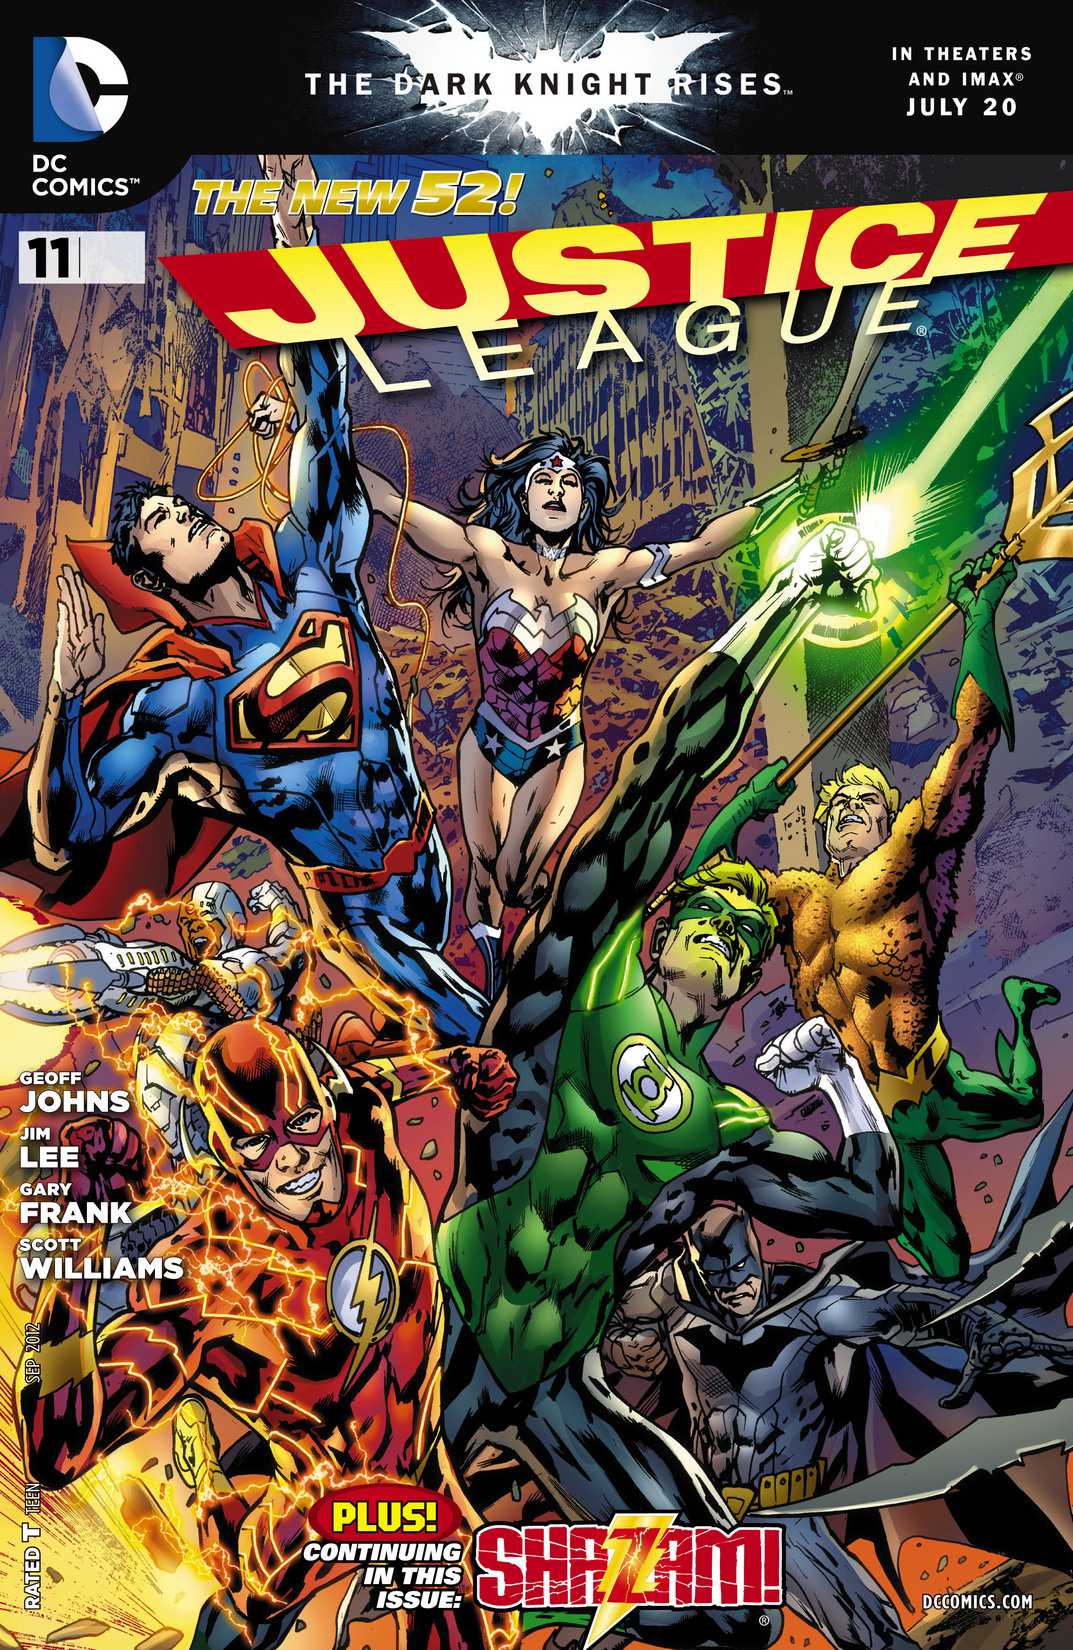 Justice League Vol 2 11 Variant A.jpg